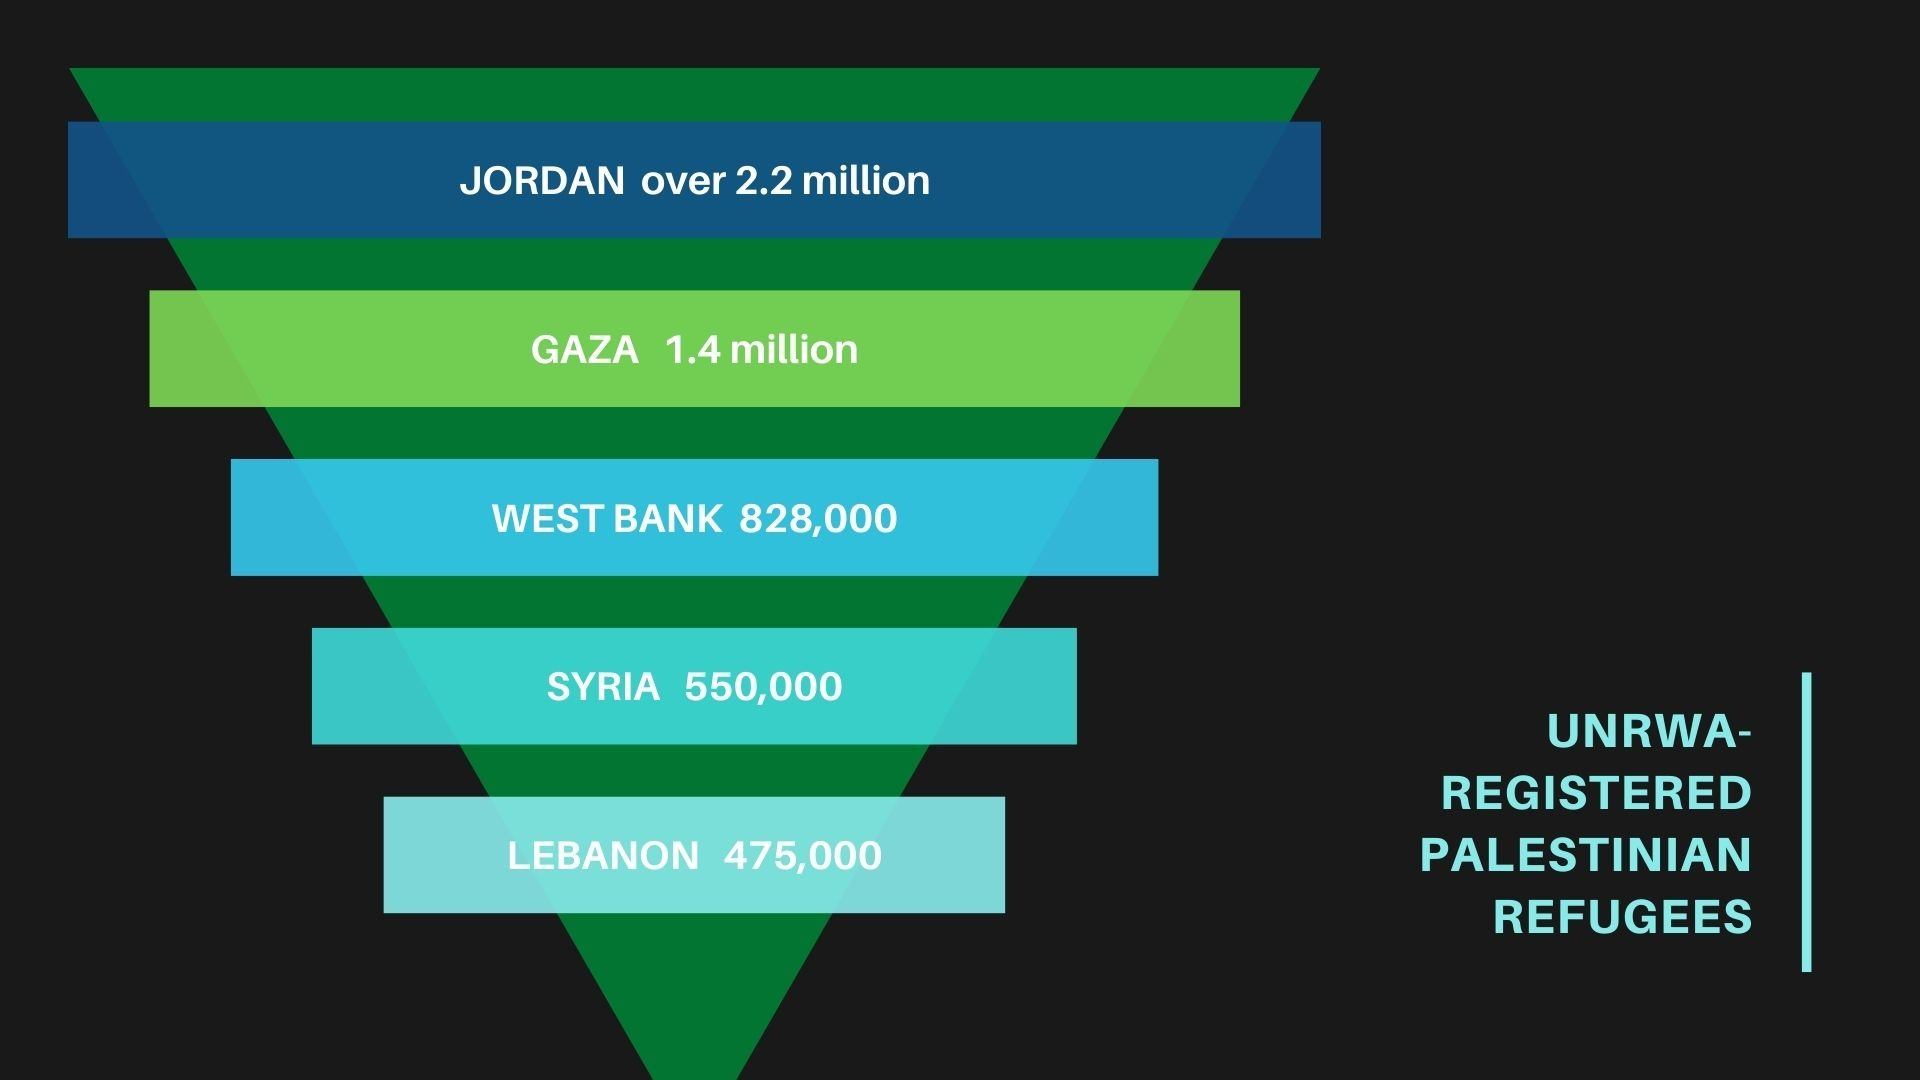 UNRWA registered Palestinian refugees